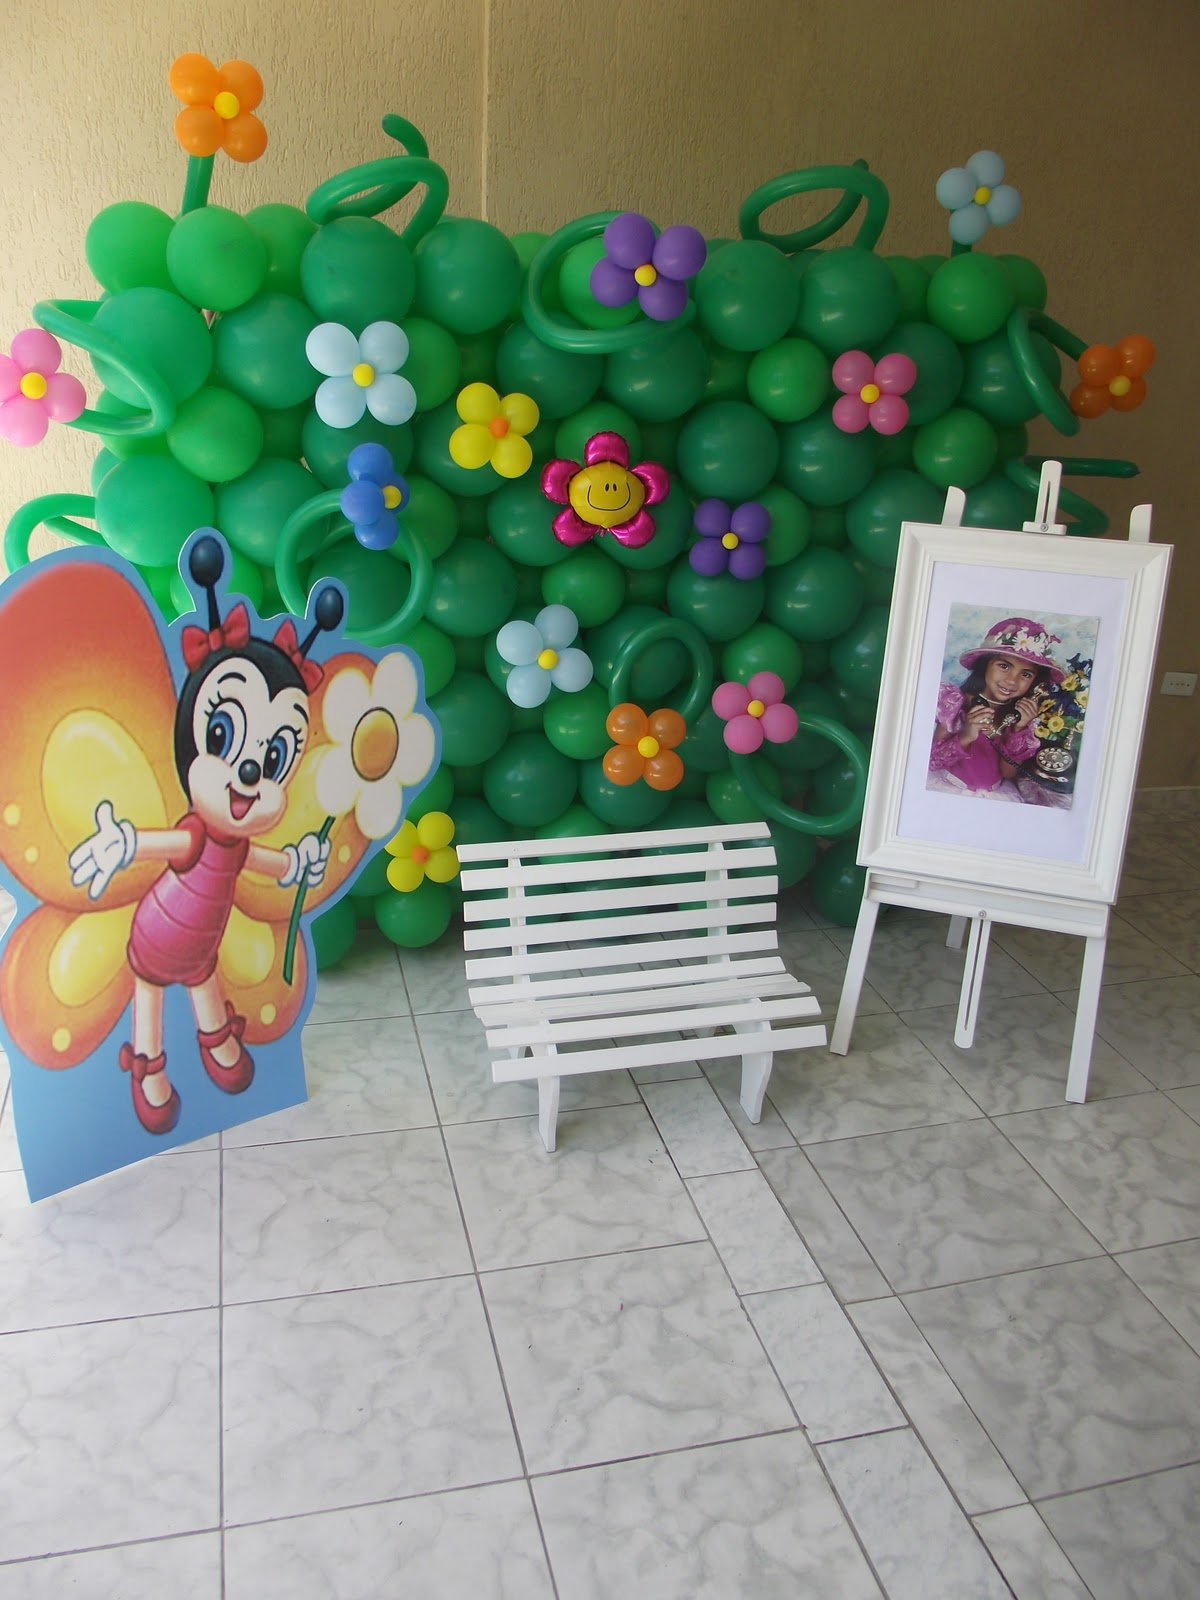 decoracao infantil jardim encantado provencal : decoracao infantil jardim encantado provencal:infantil Pink@Blue: Decoração Jardim encantado clean provençal